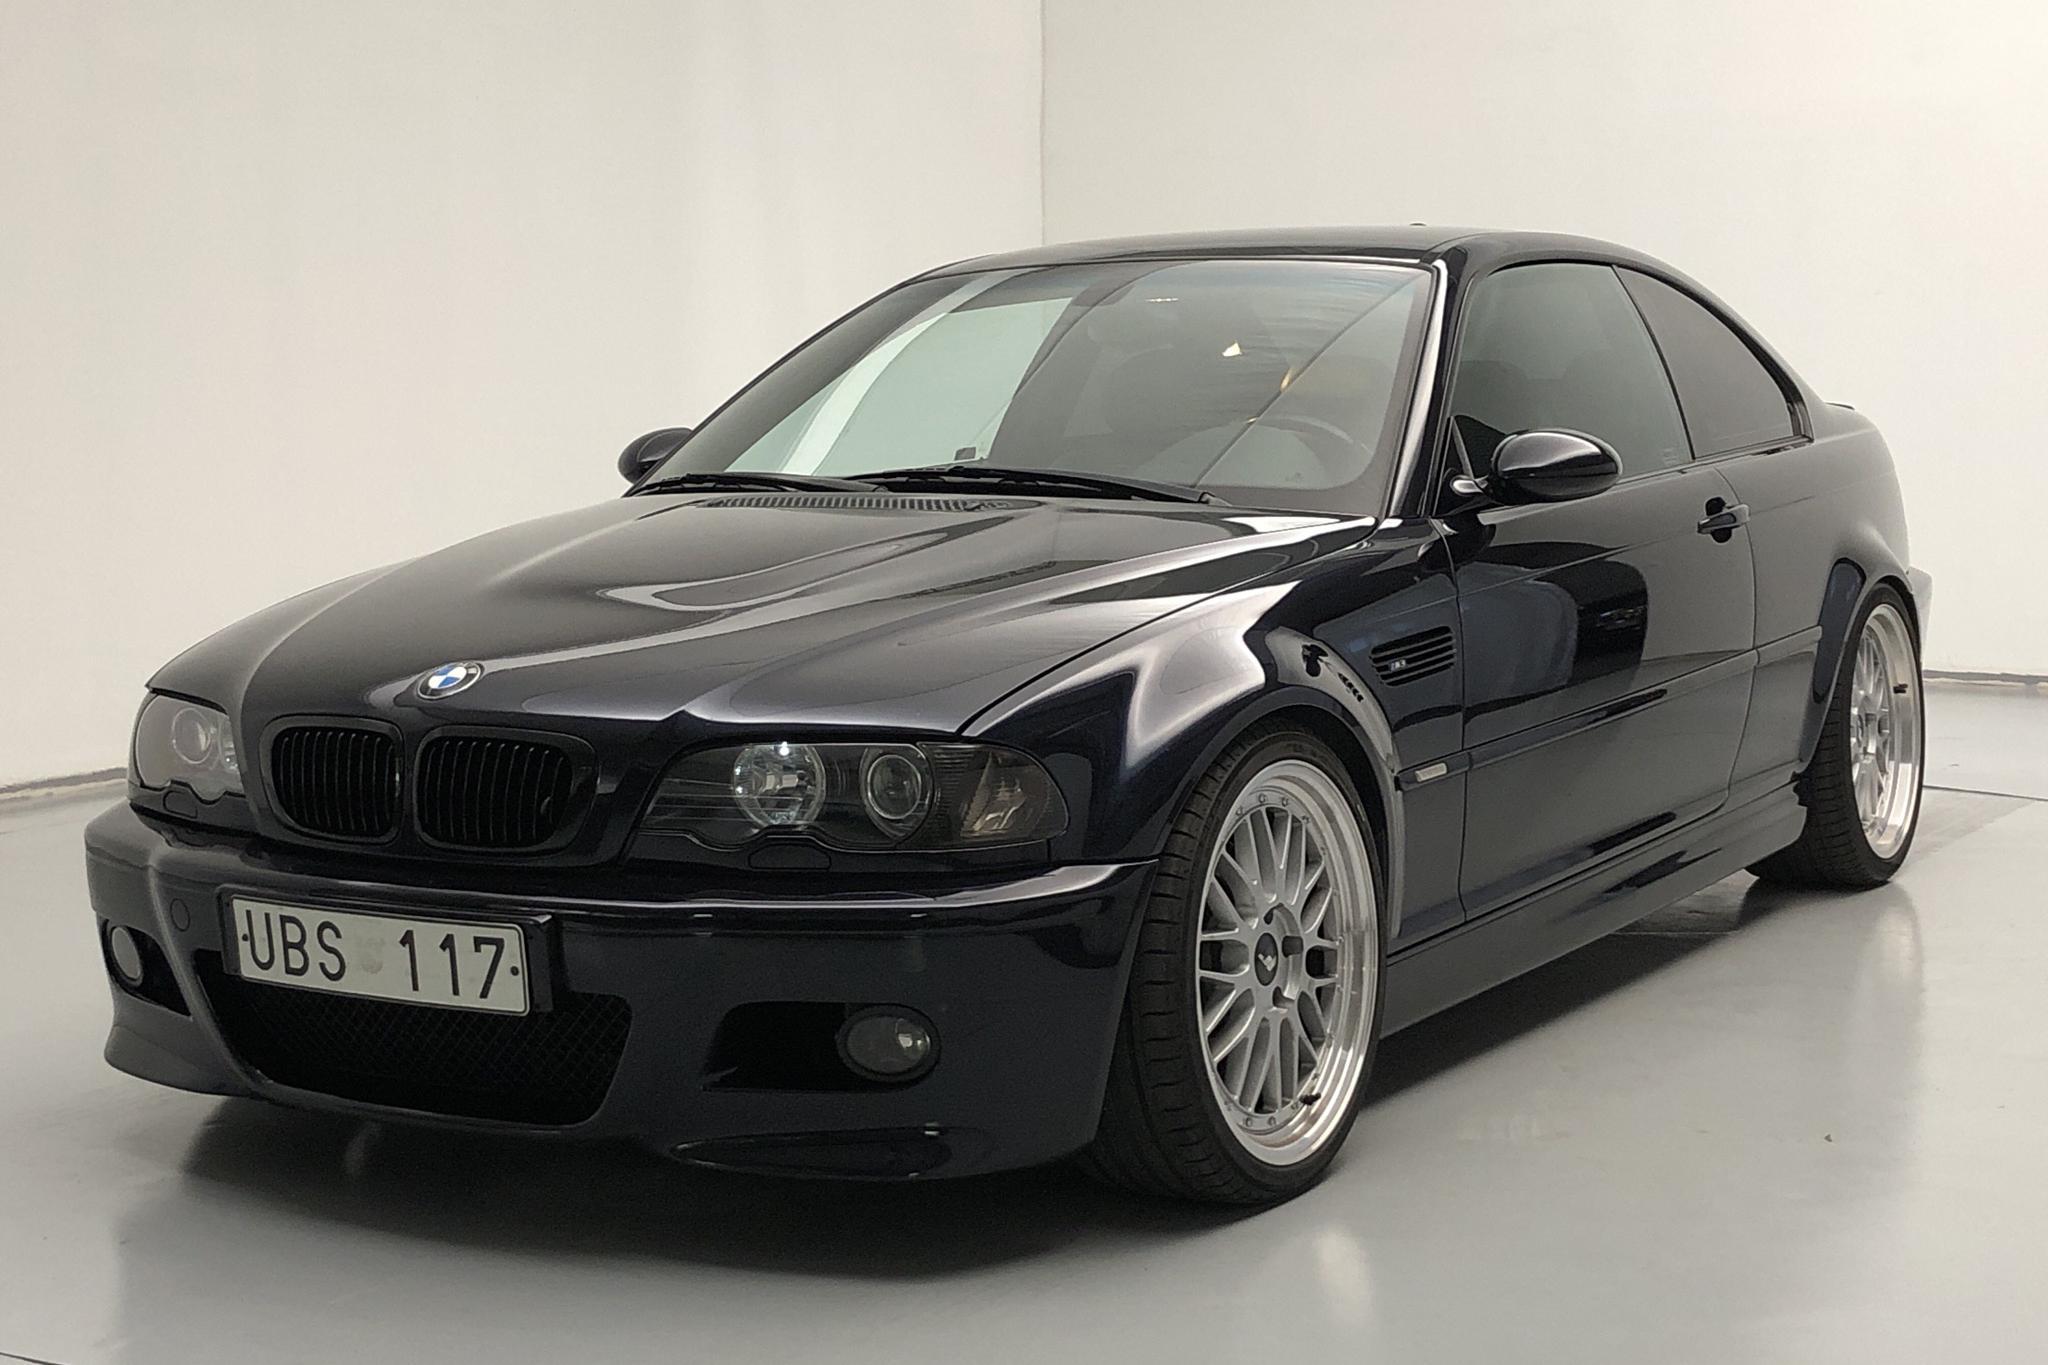 BMW M3 Coupé, E46 (343hk)